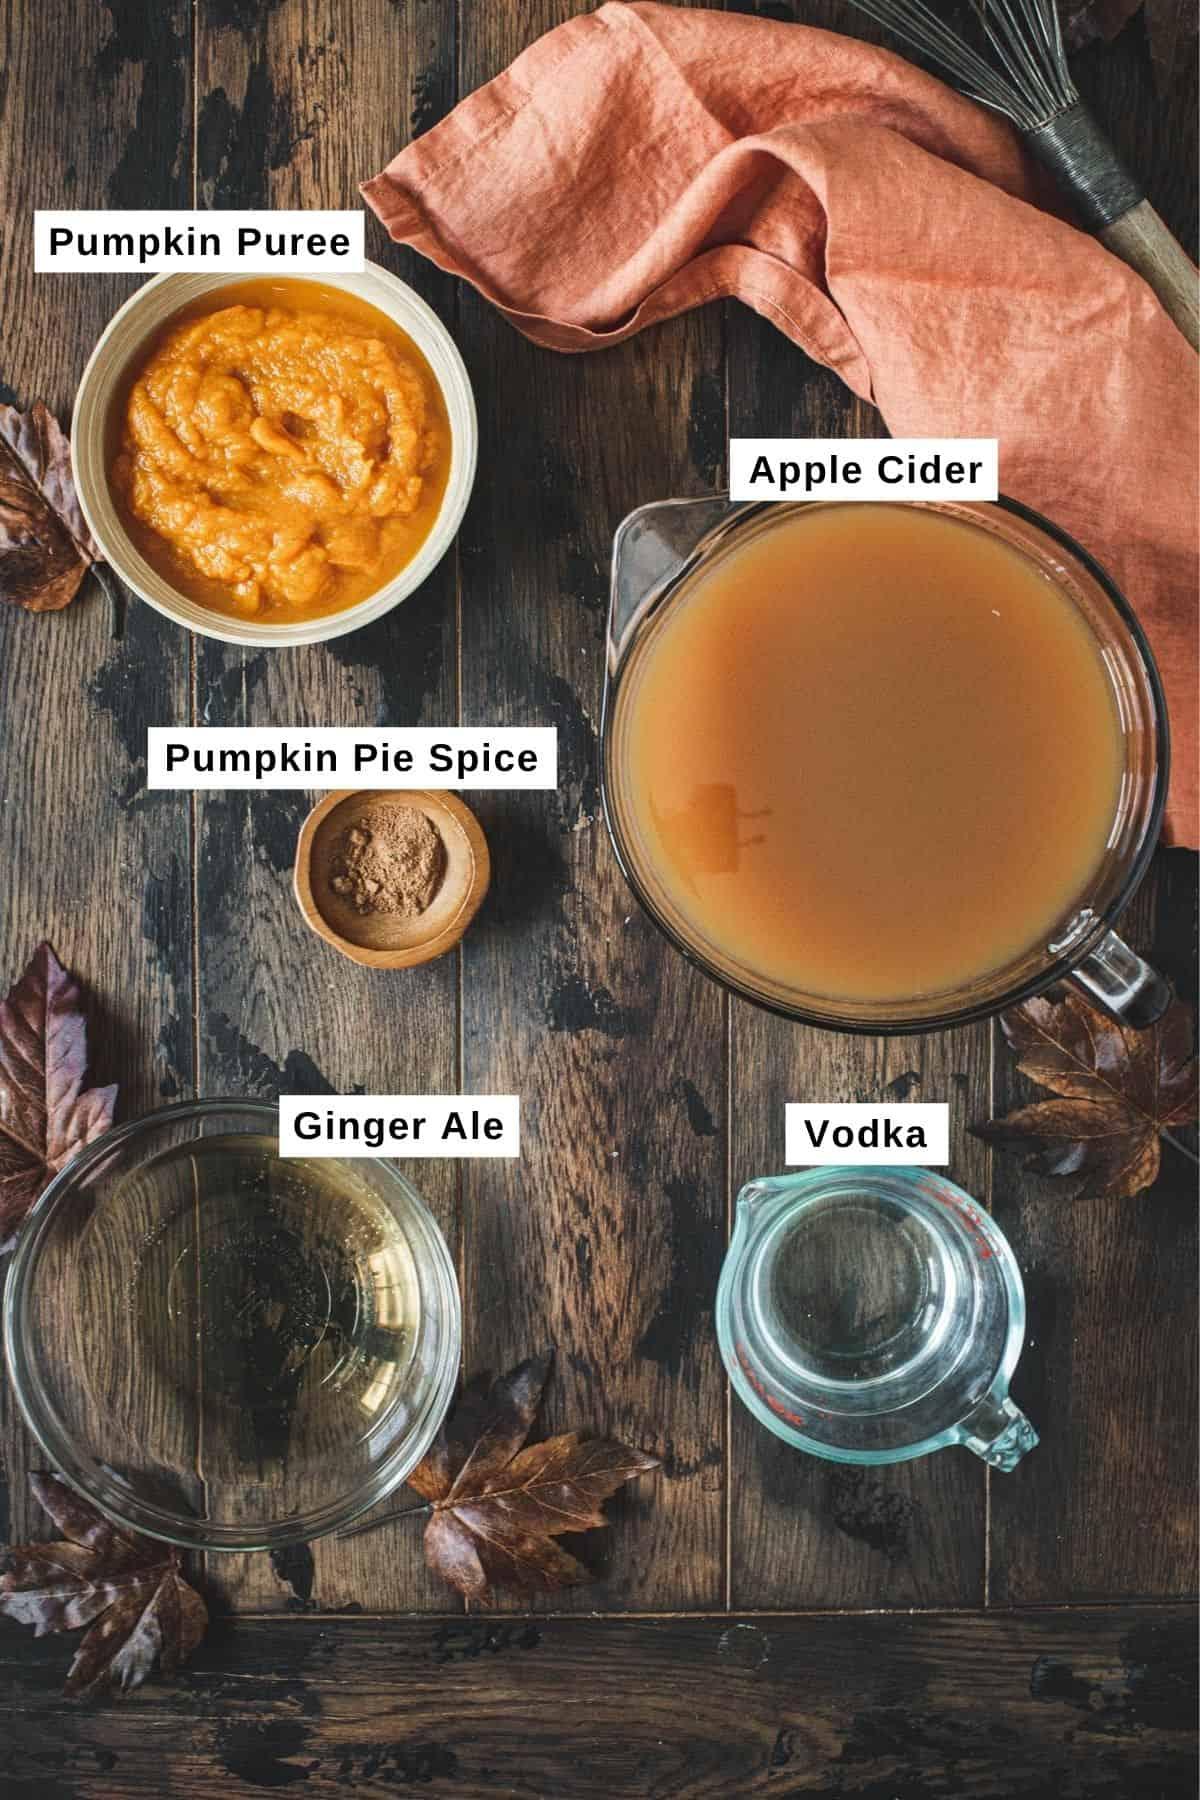 Halloween pumpkin punch ingredients in bowls.